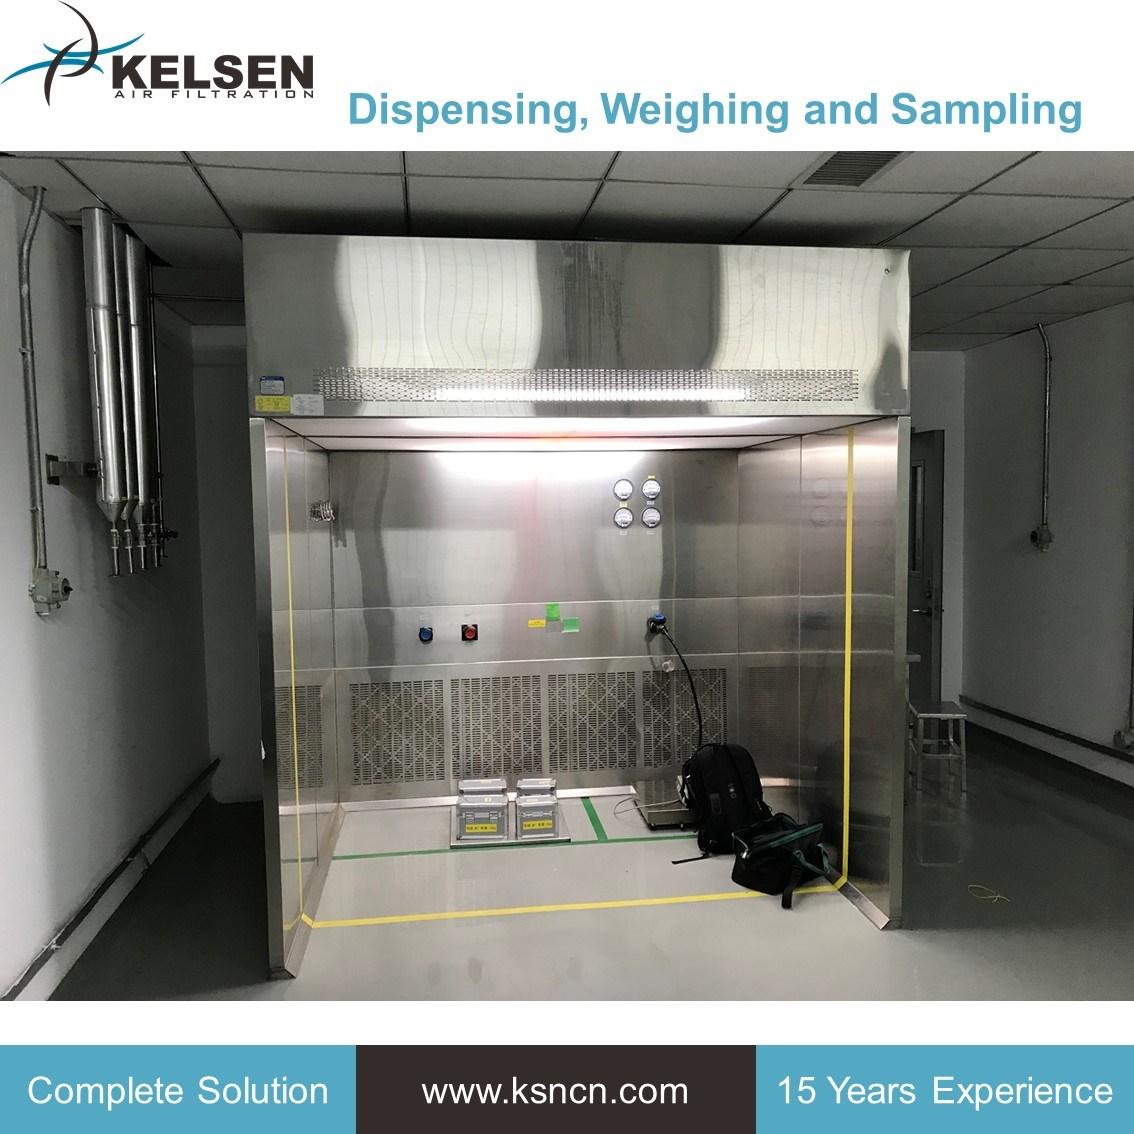 China Pharmaceutical Cleanroom Hepa Equipped Sampling